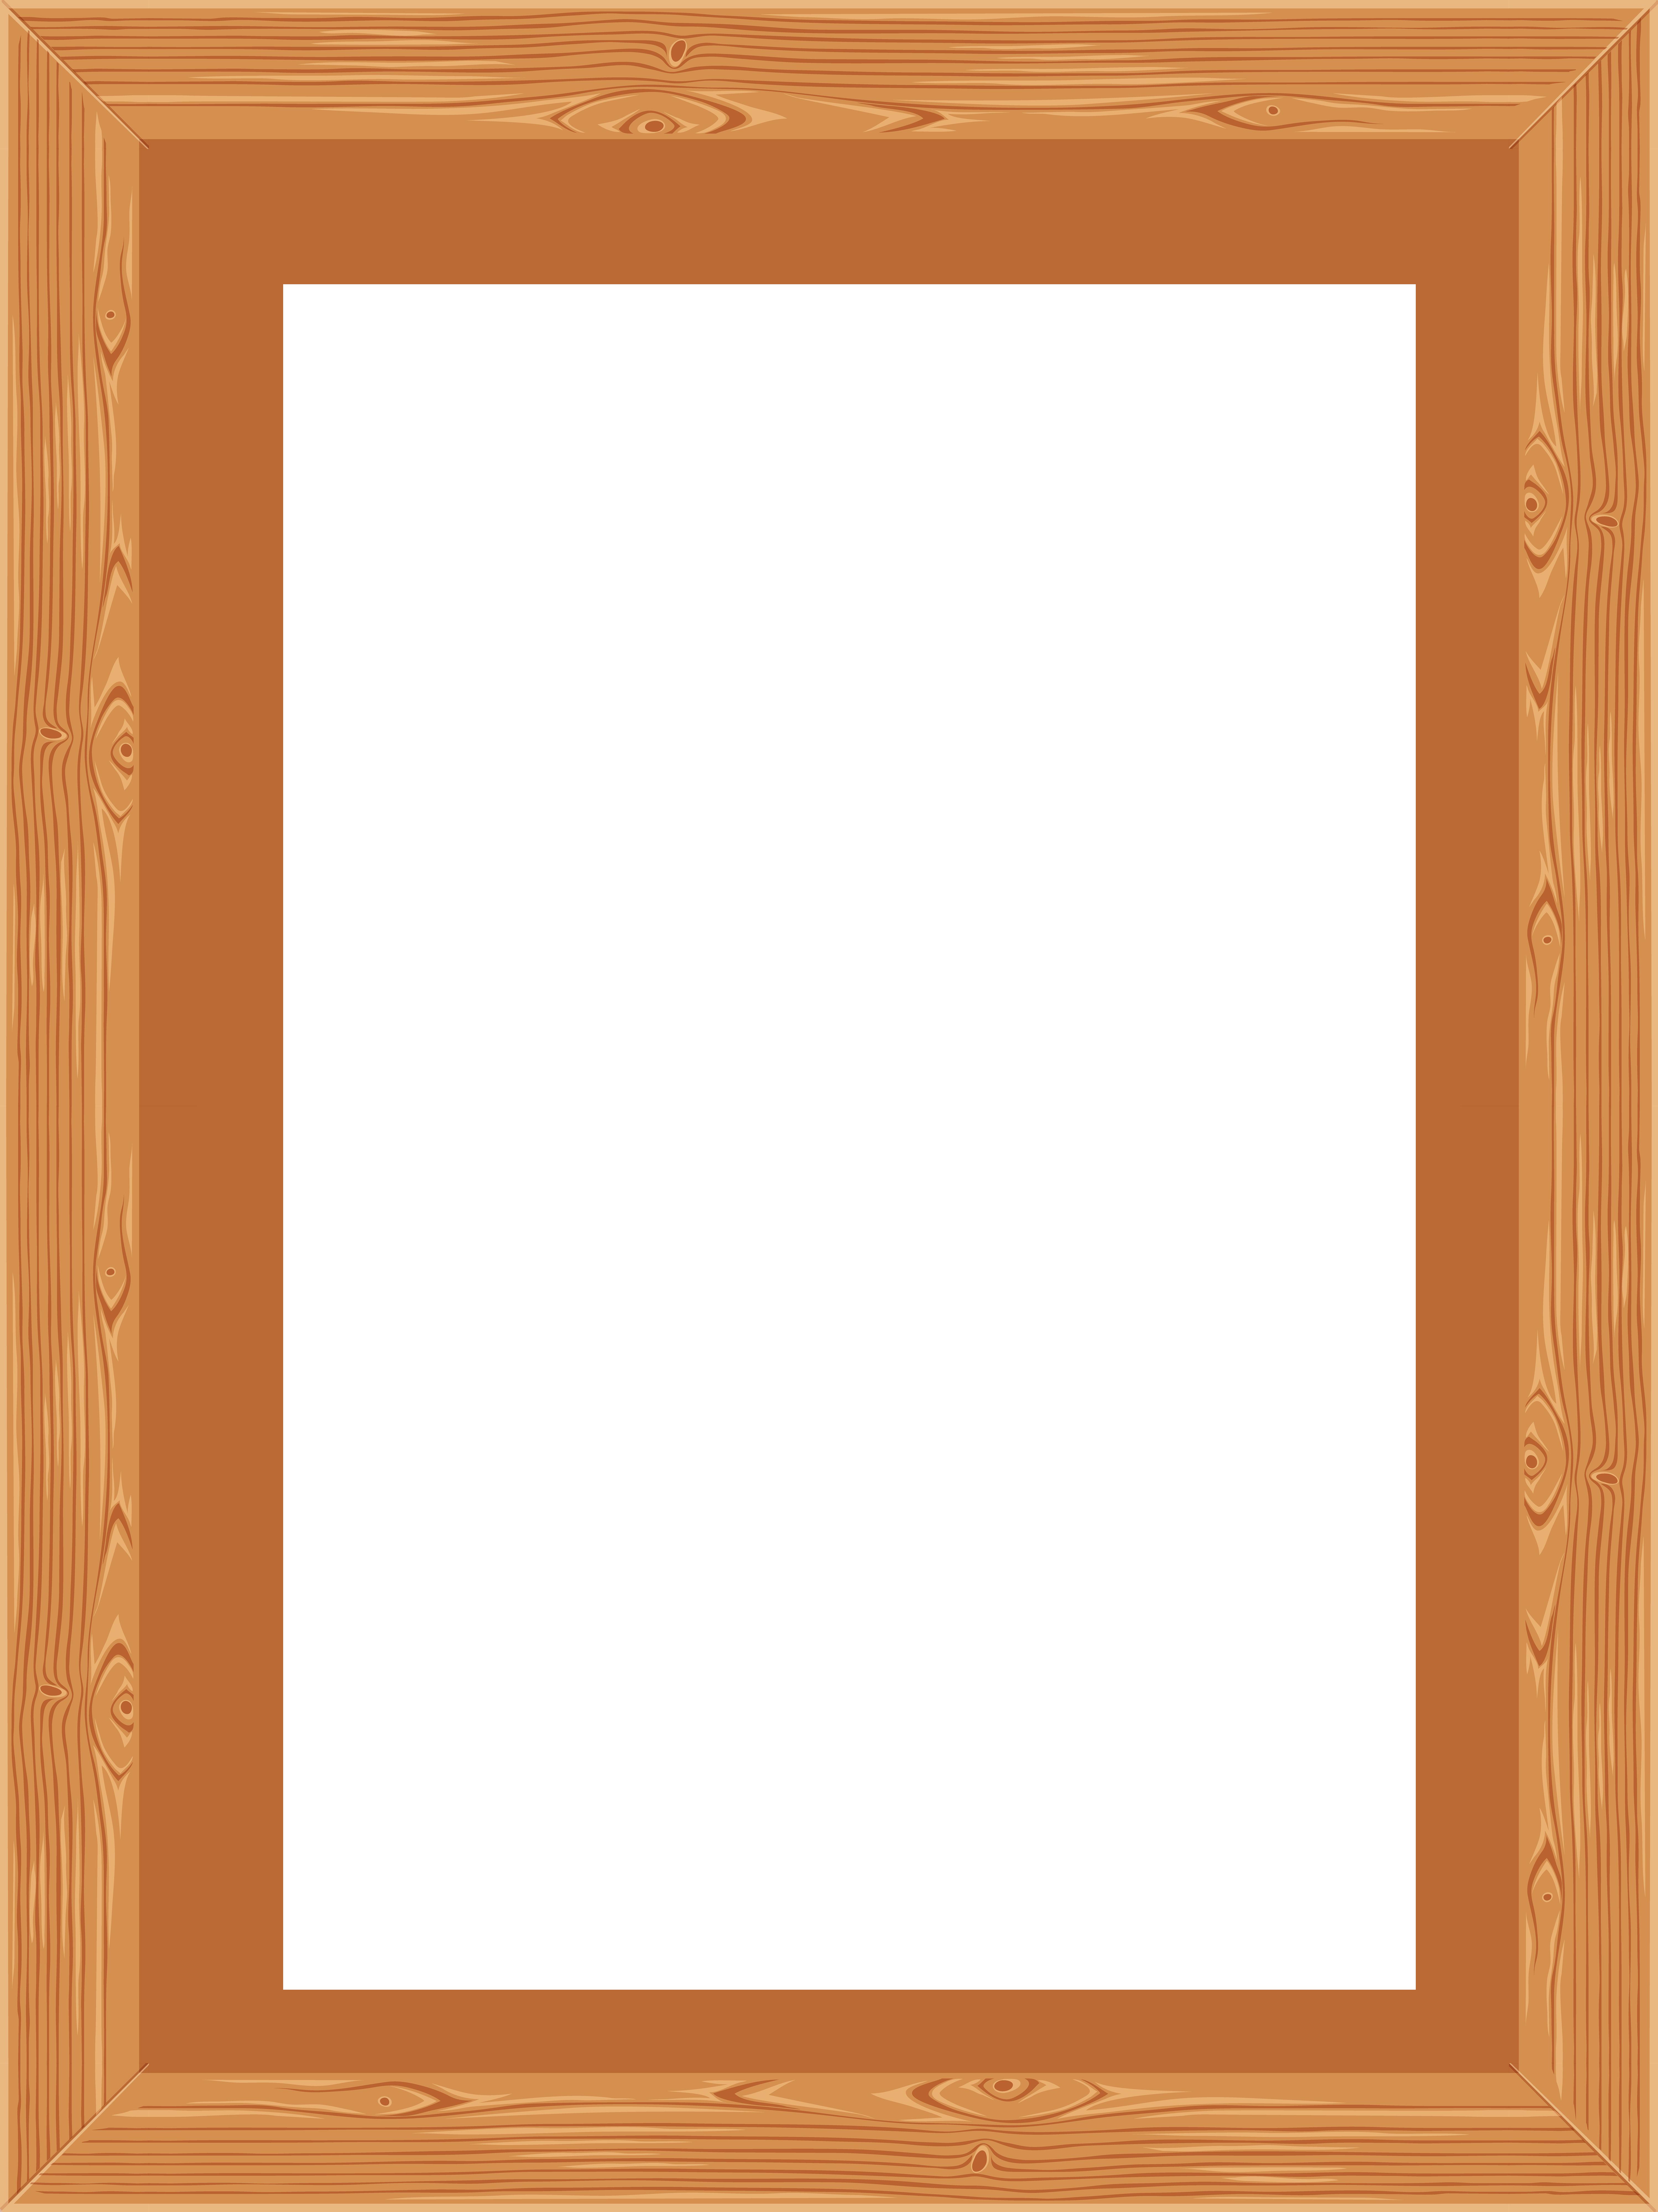 Wood frames clipart png png transparent download Transparent Classic Wooden Frame PNG Image   Gallery ... png transparent download